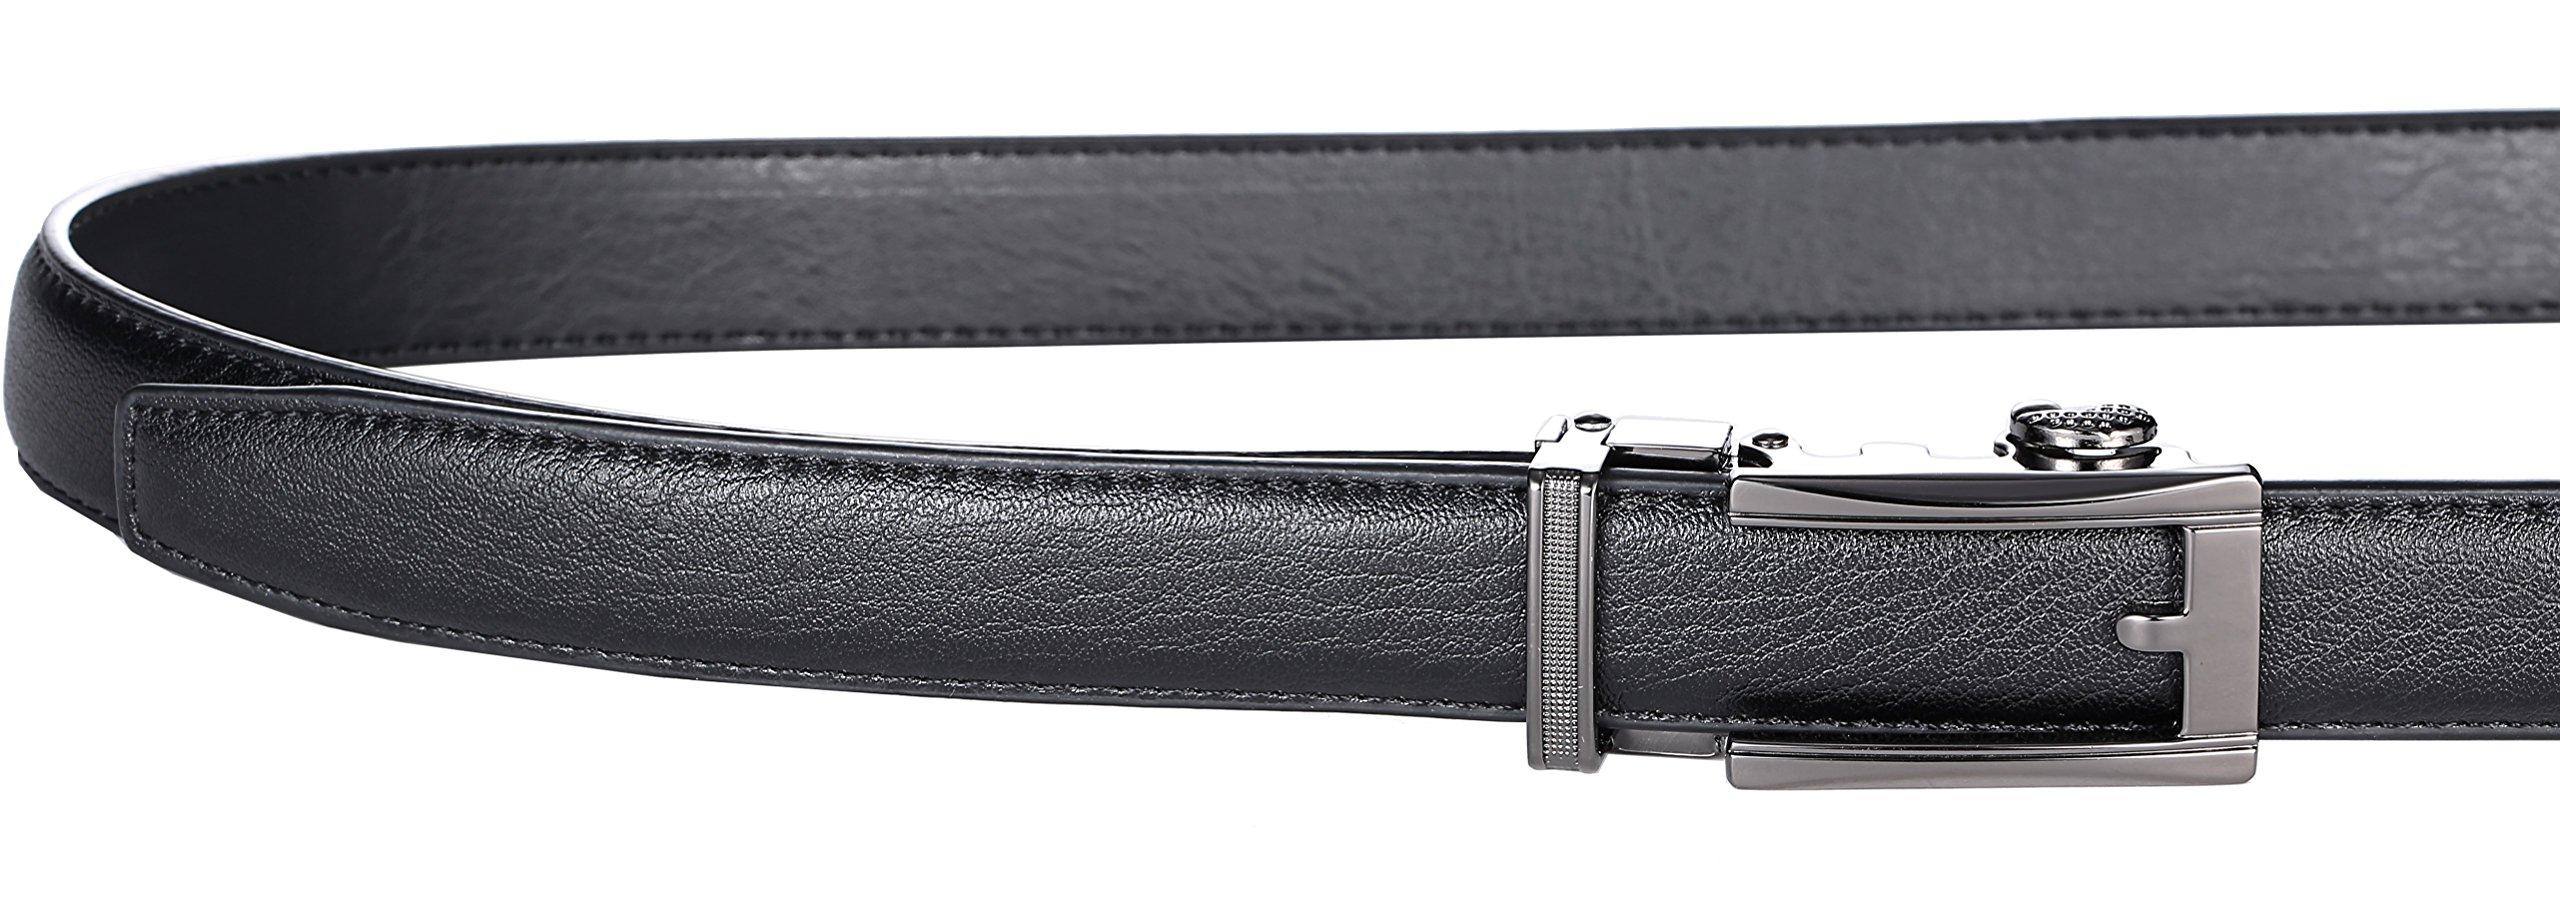 Marino Boy's Genuine Leather Belt, Ratchet Dress Belt with Automatic Buckle - 5-16 - Gunblack Silver Open Buckle with Black Leather by Marino Avenue (Image #2)